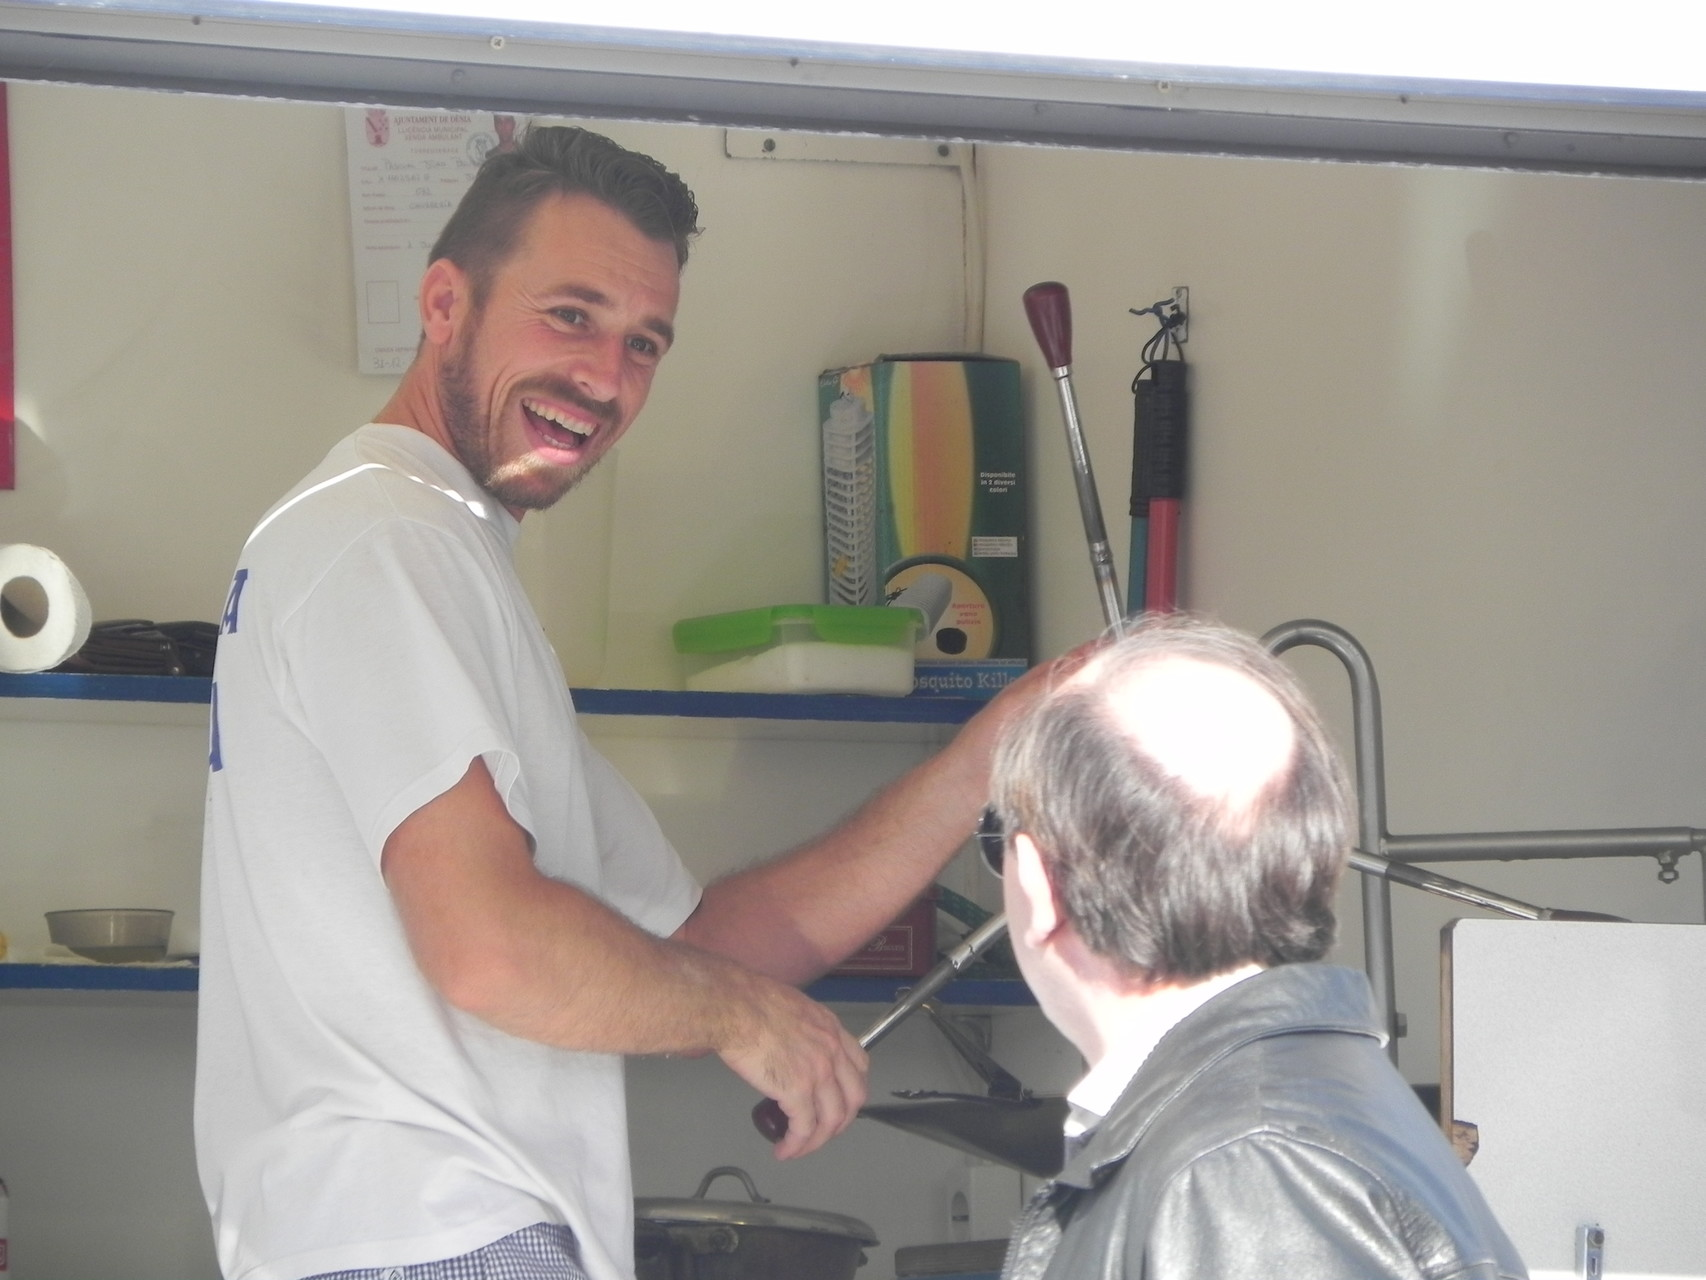 Pasquale hält leckere Churros bereit